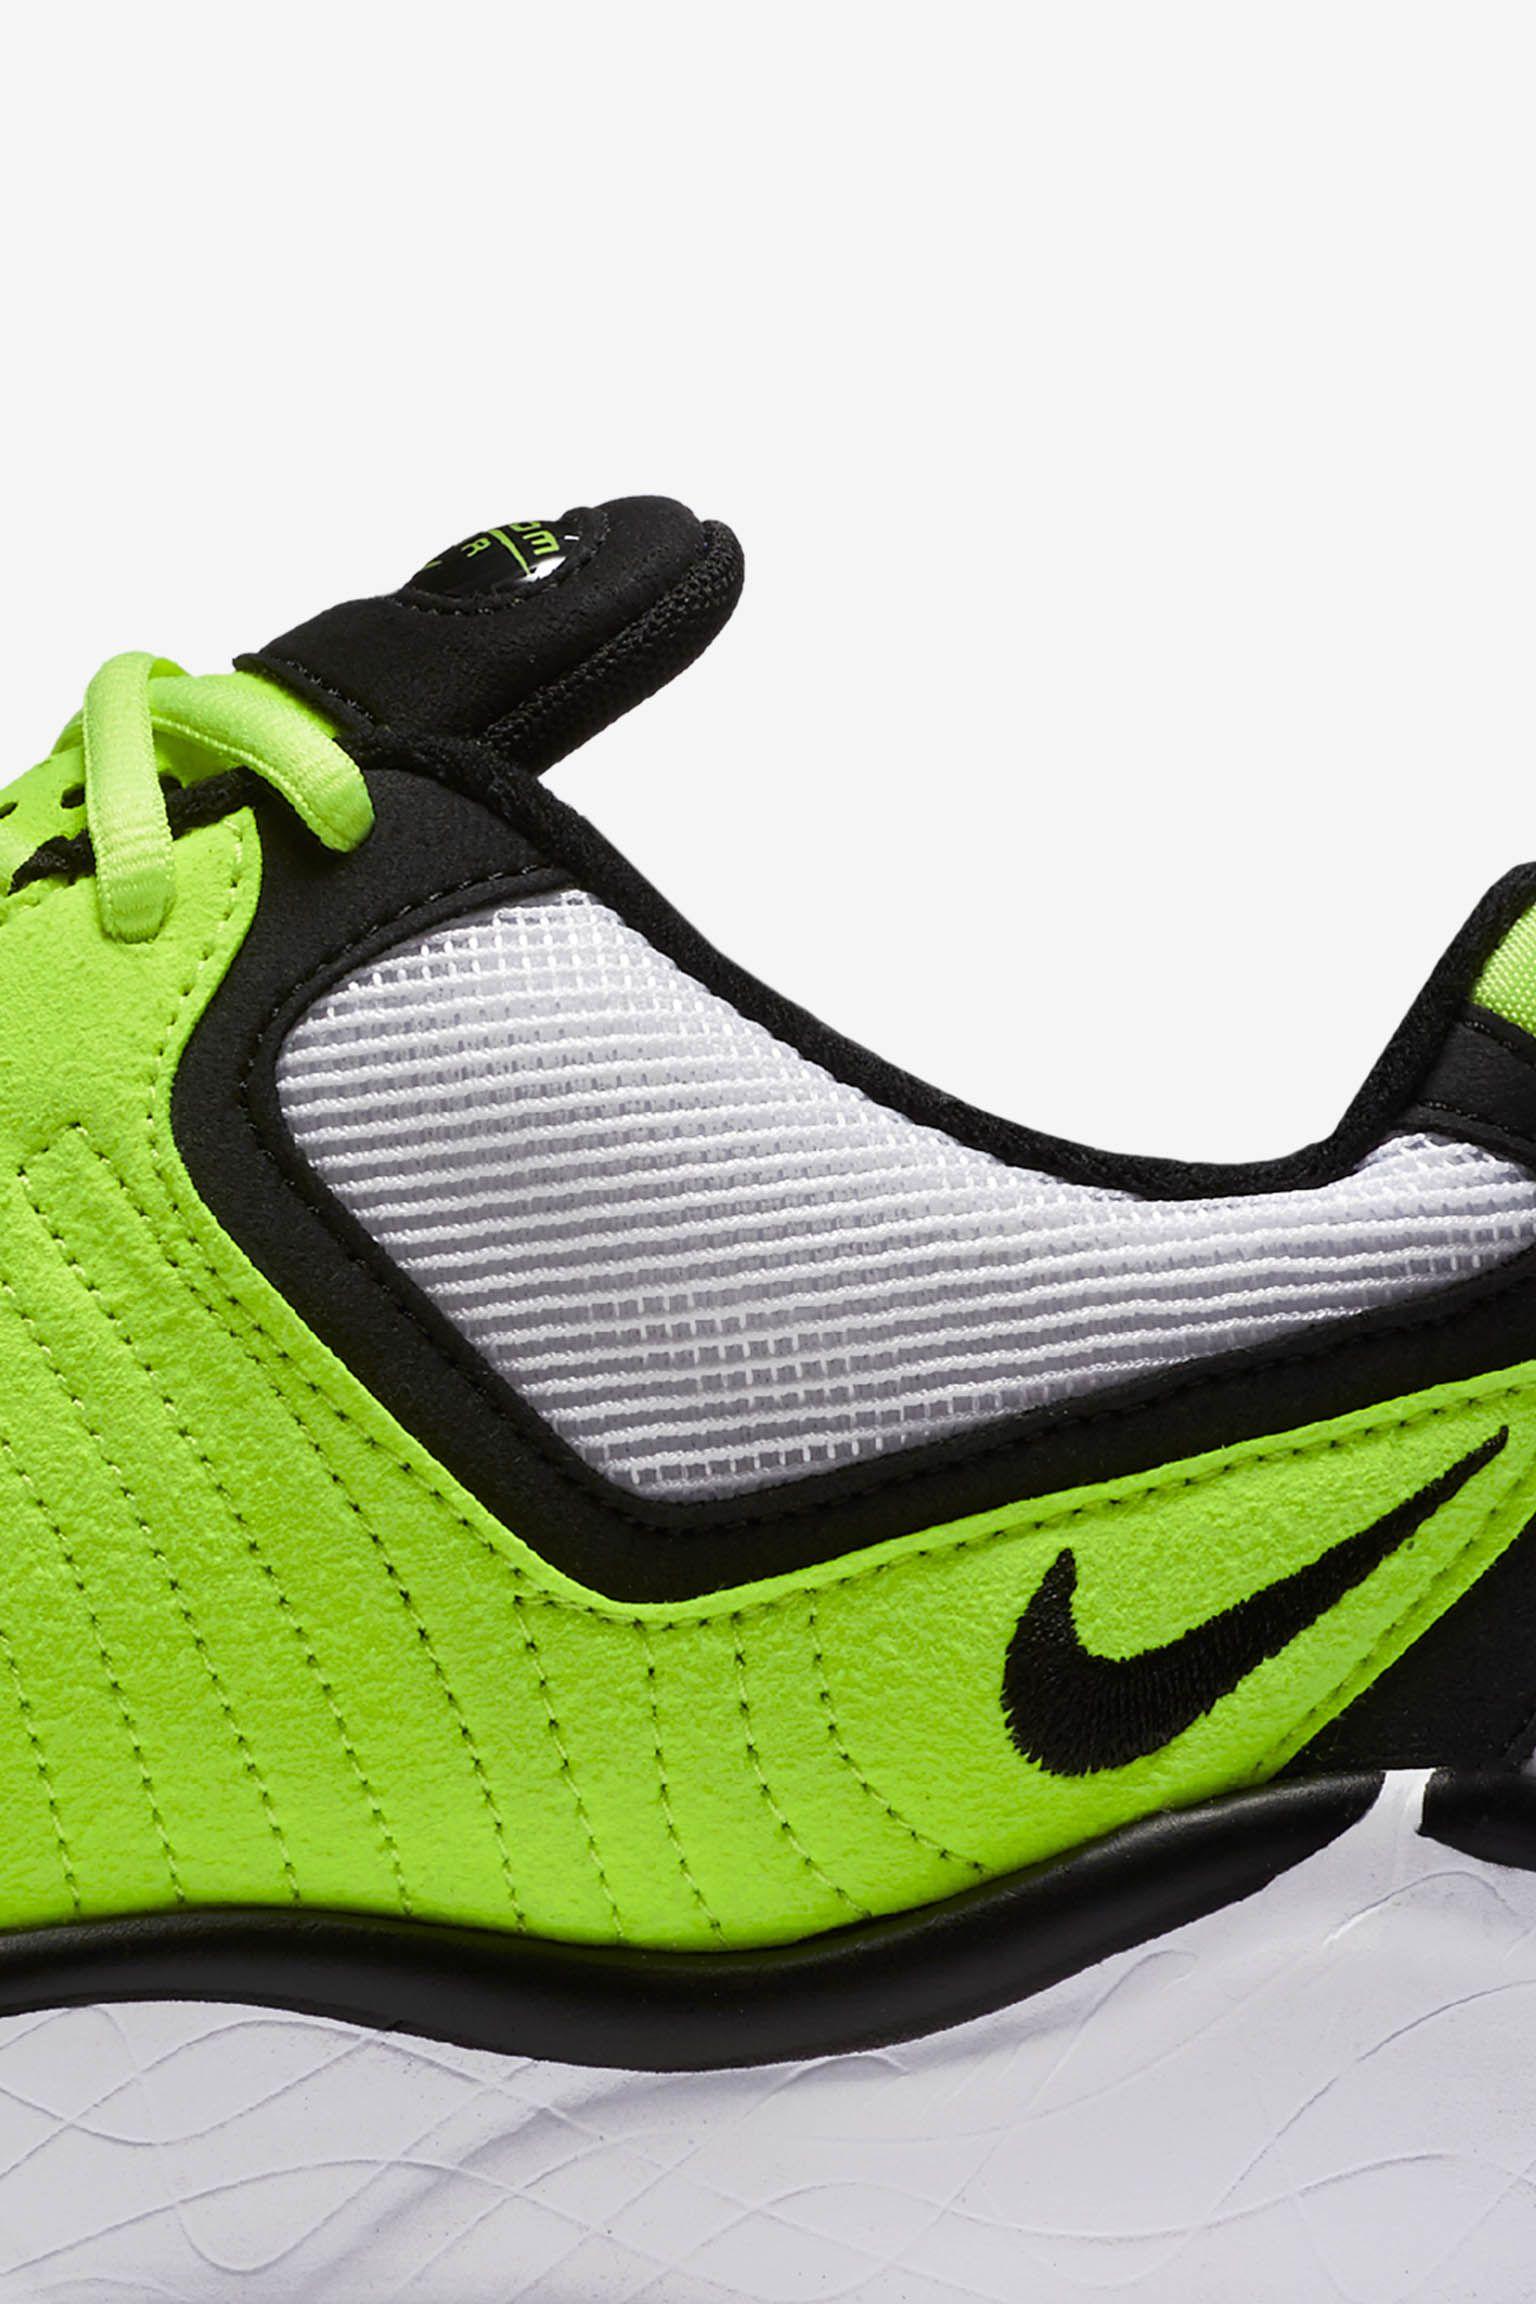 Nike Air Zoom Talaria 'White & Black & Volt'